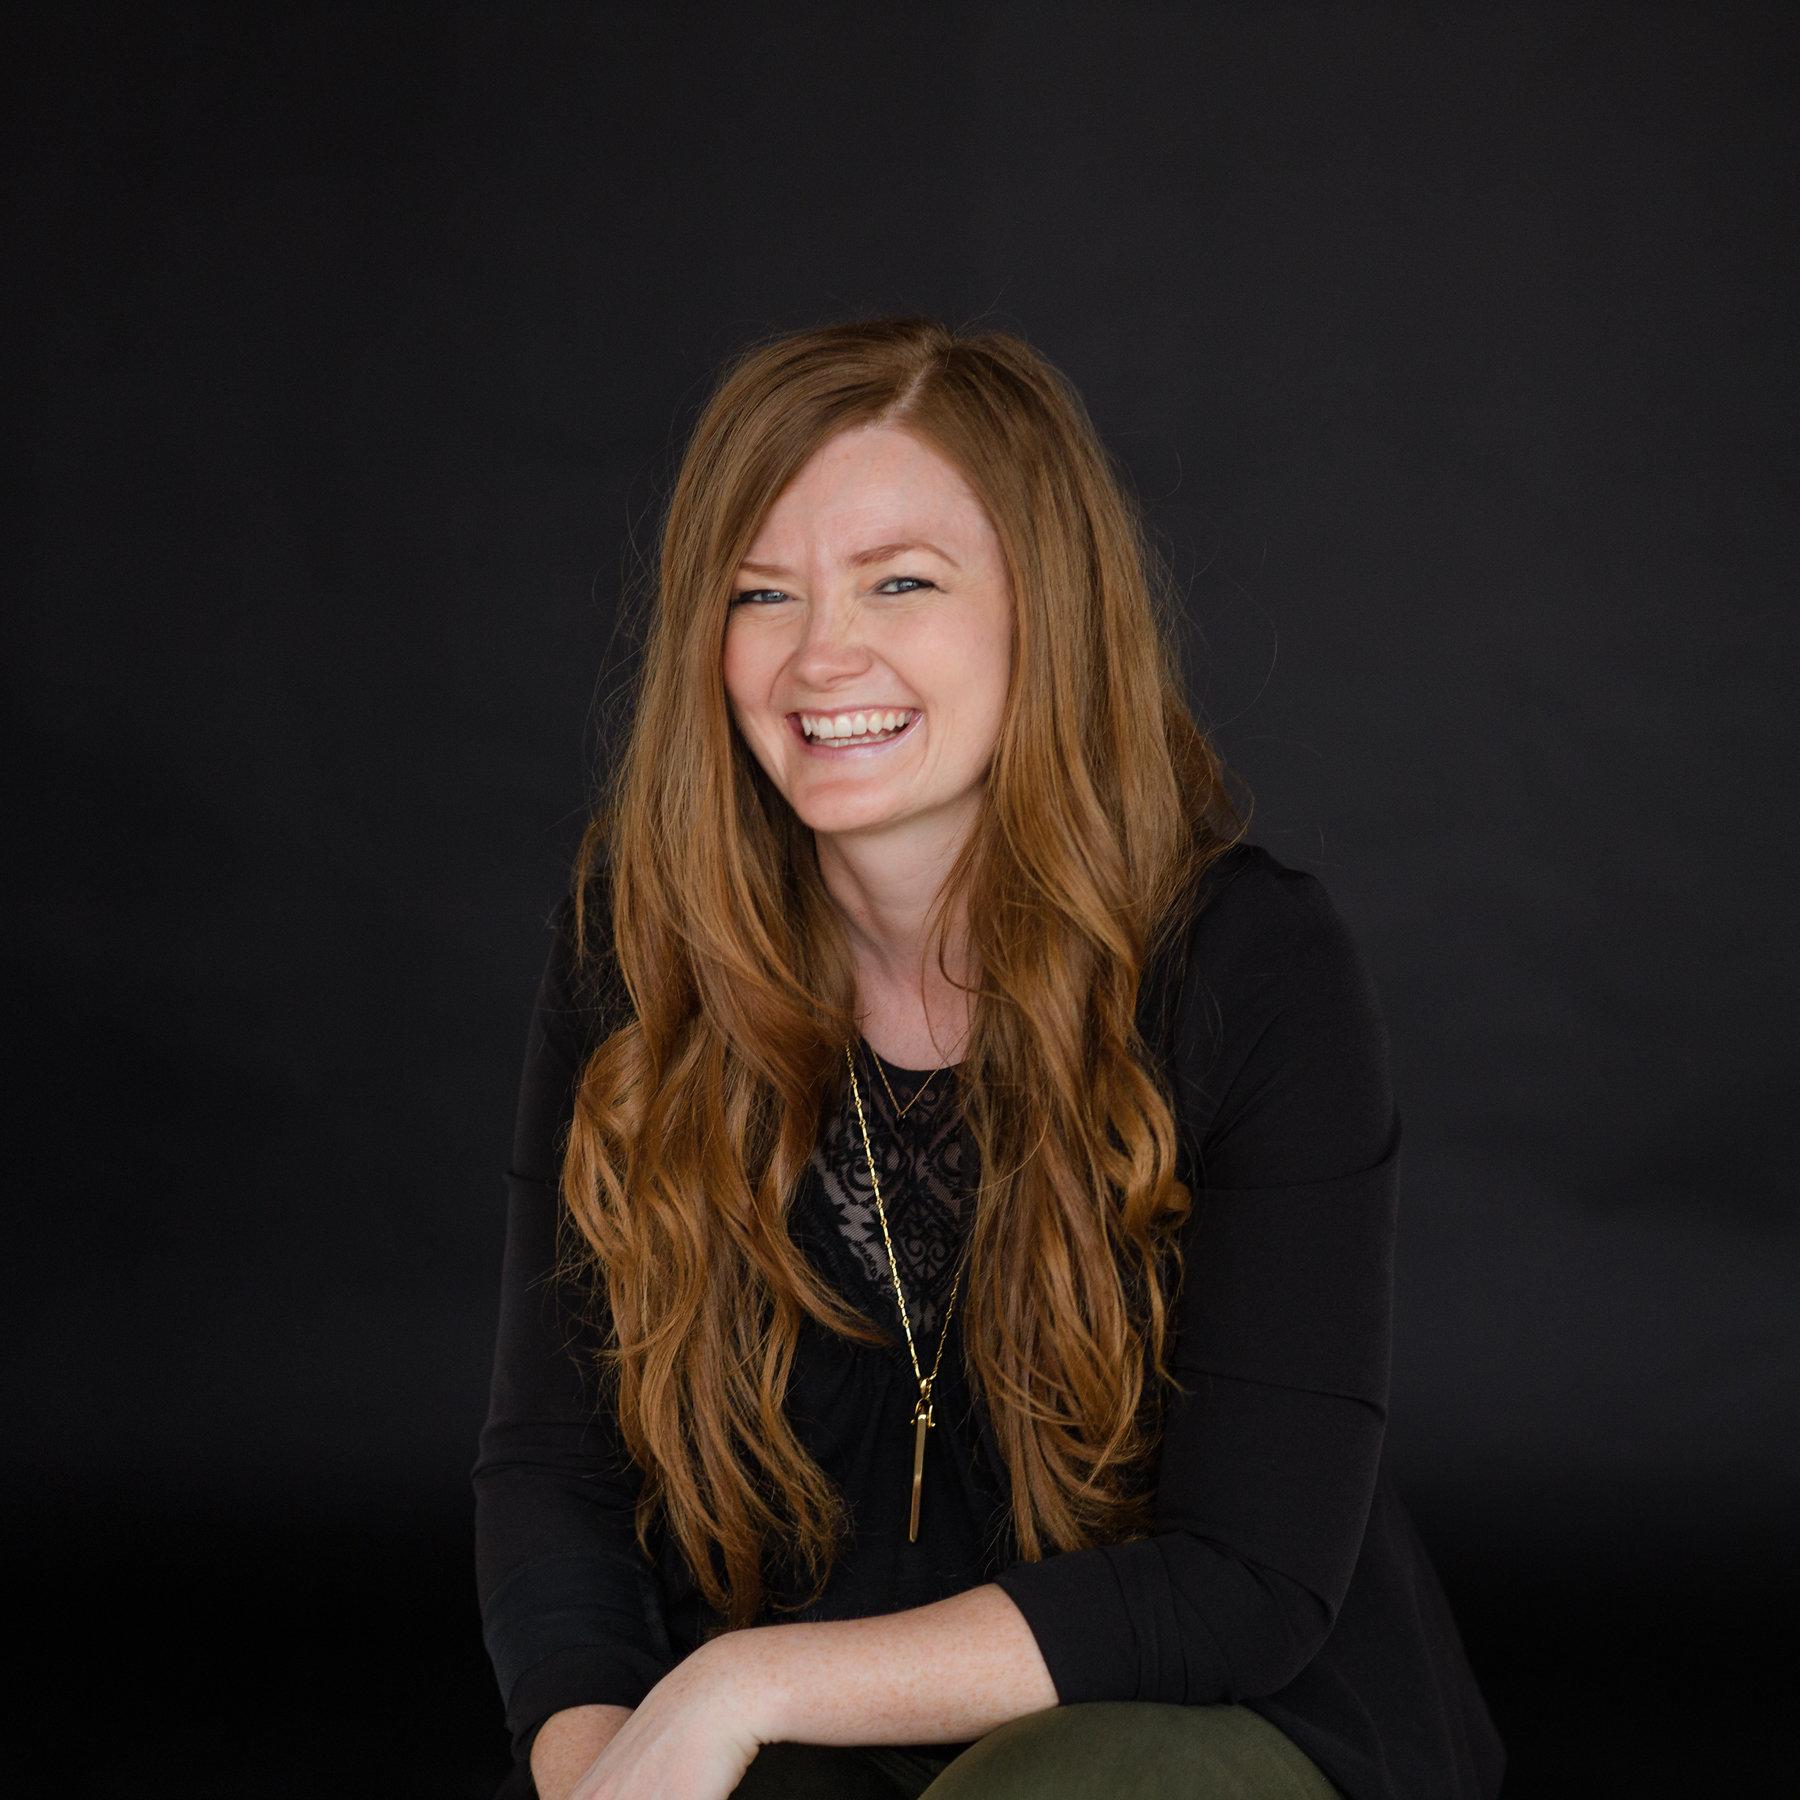 Creative Director - Corinne McDonald